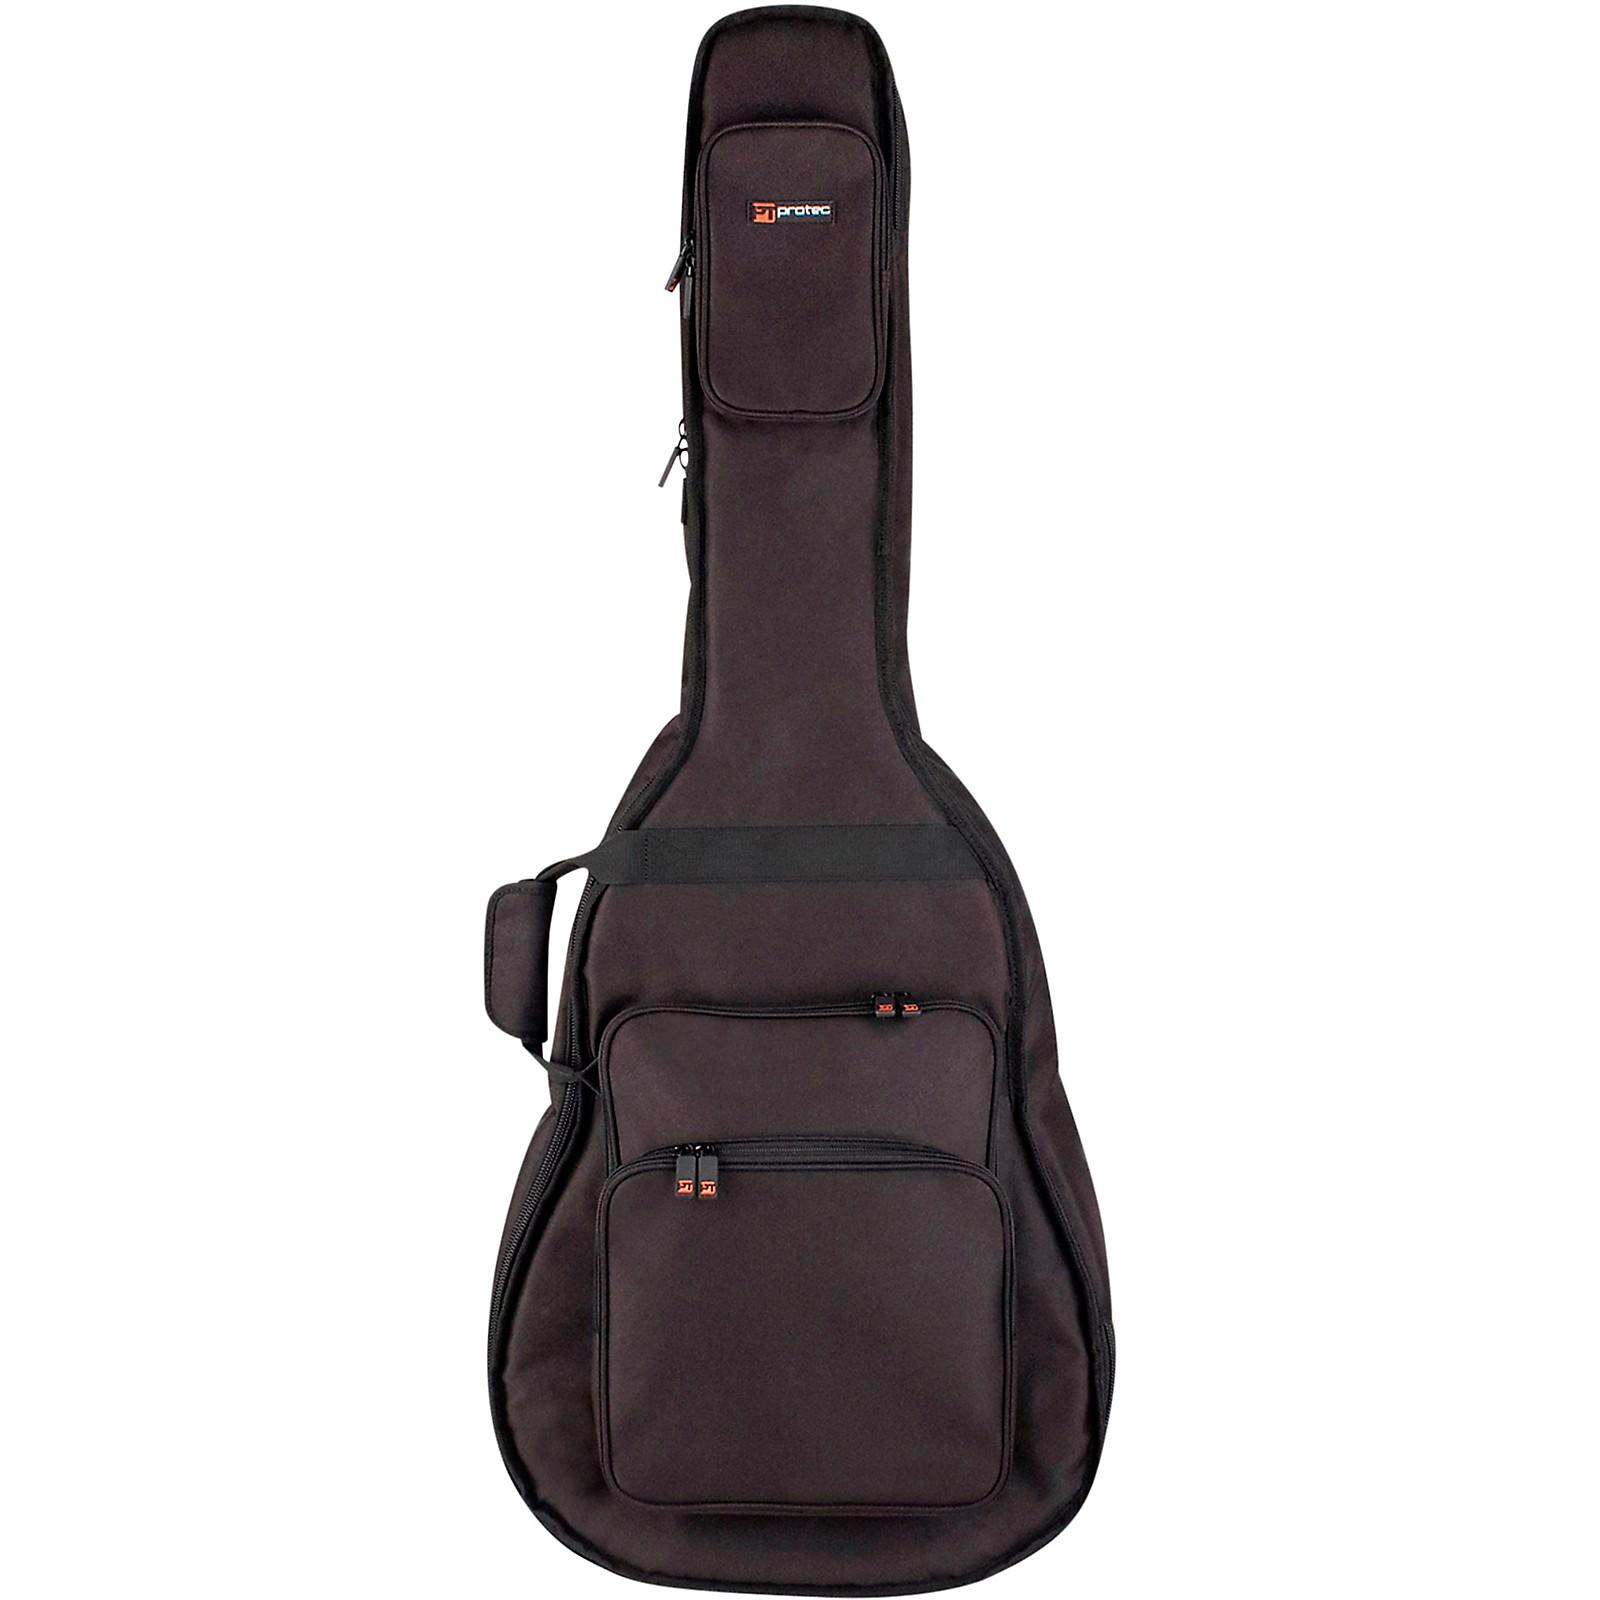 Protec Hollow Body Electric Guitar Gig Bag-Gold Series